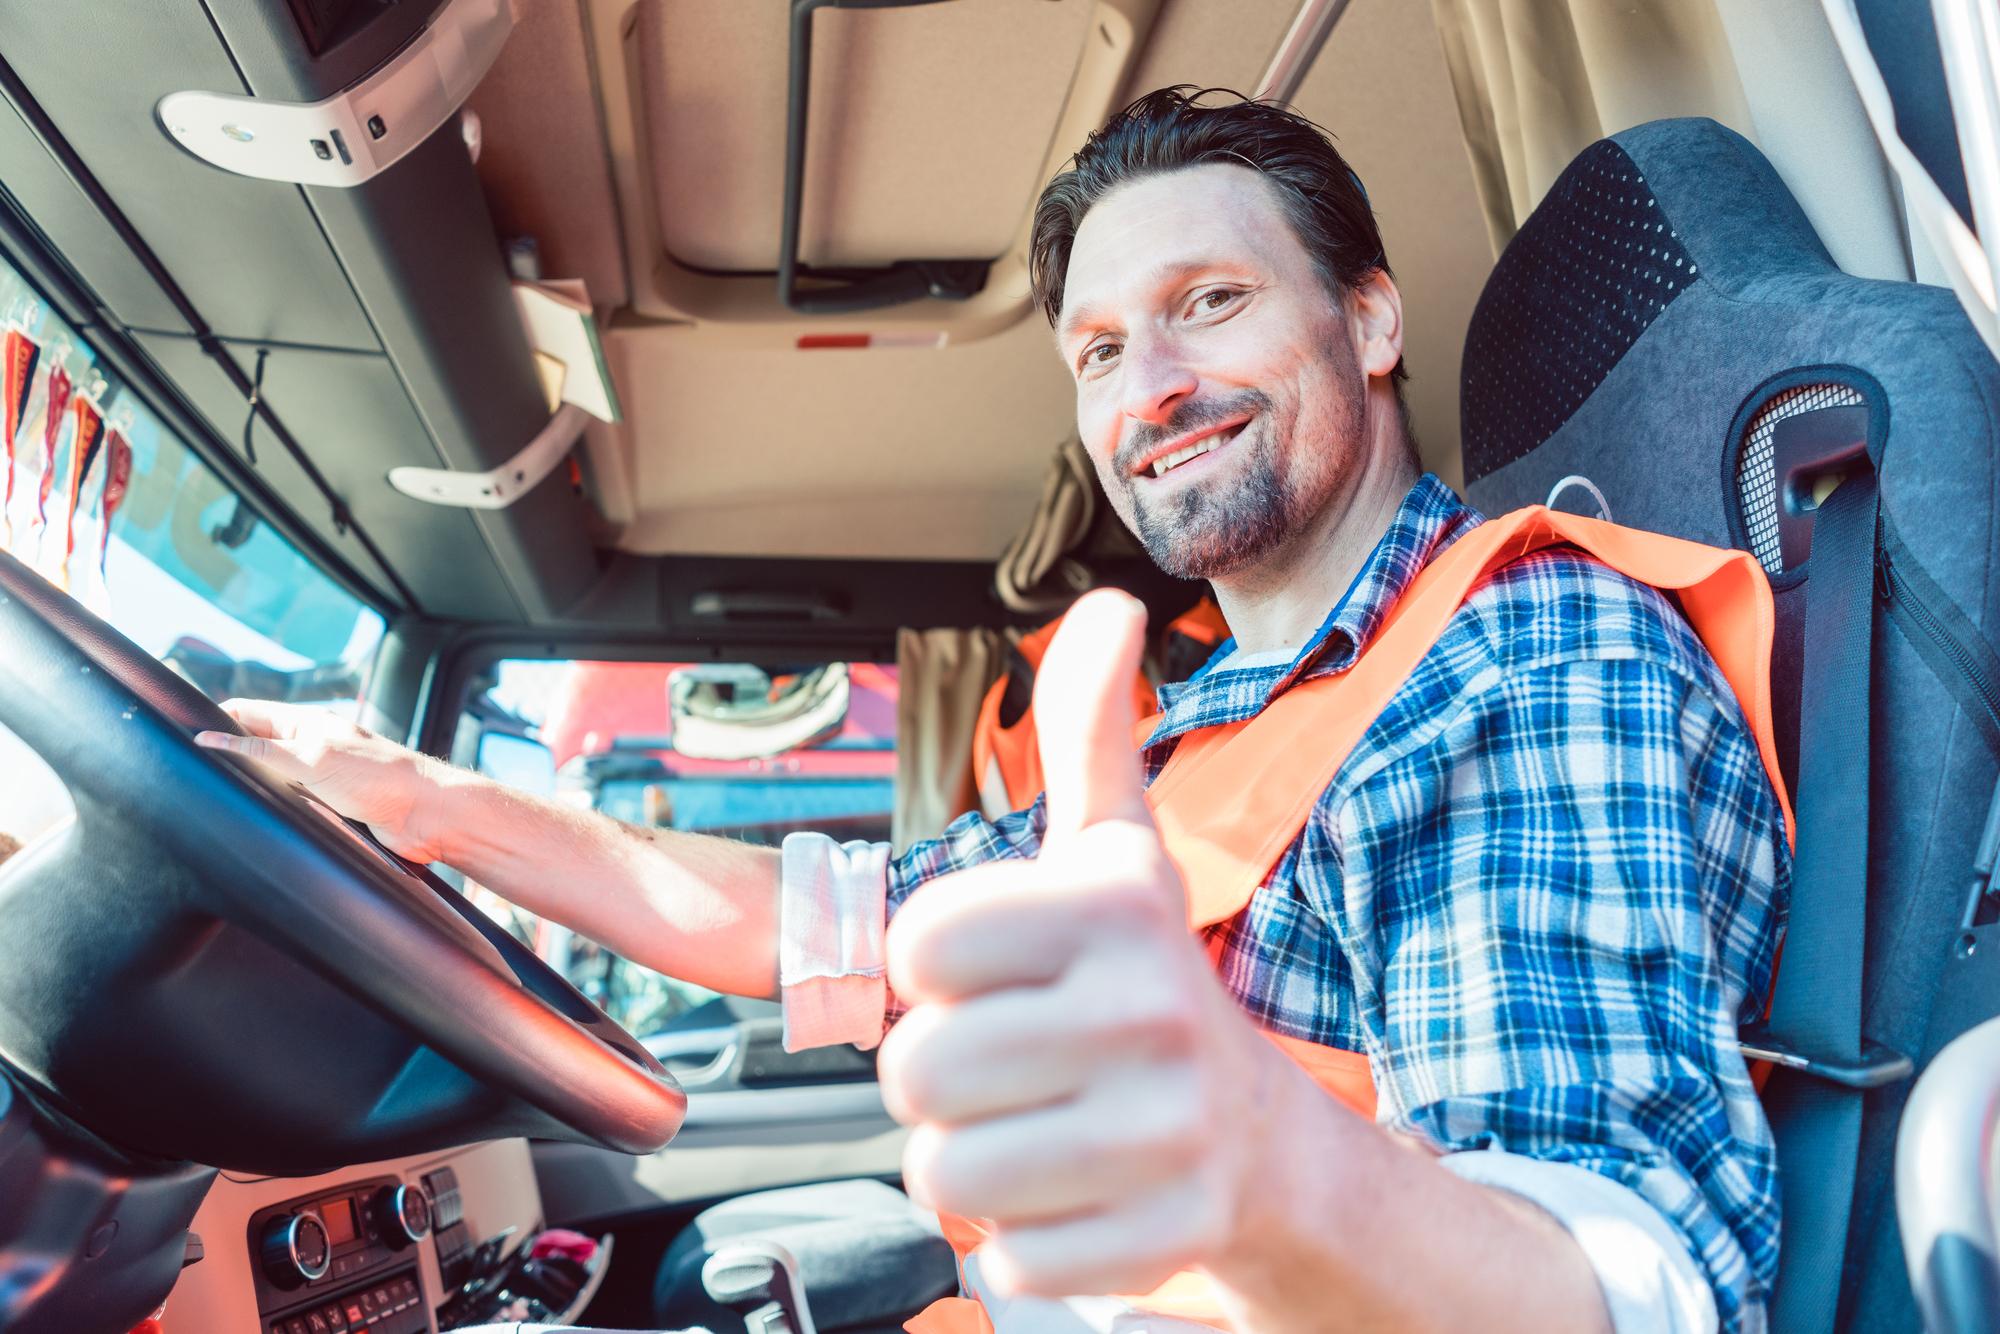 A happy truck driver